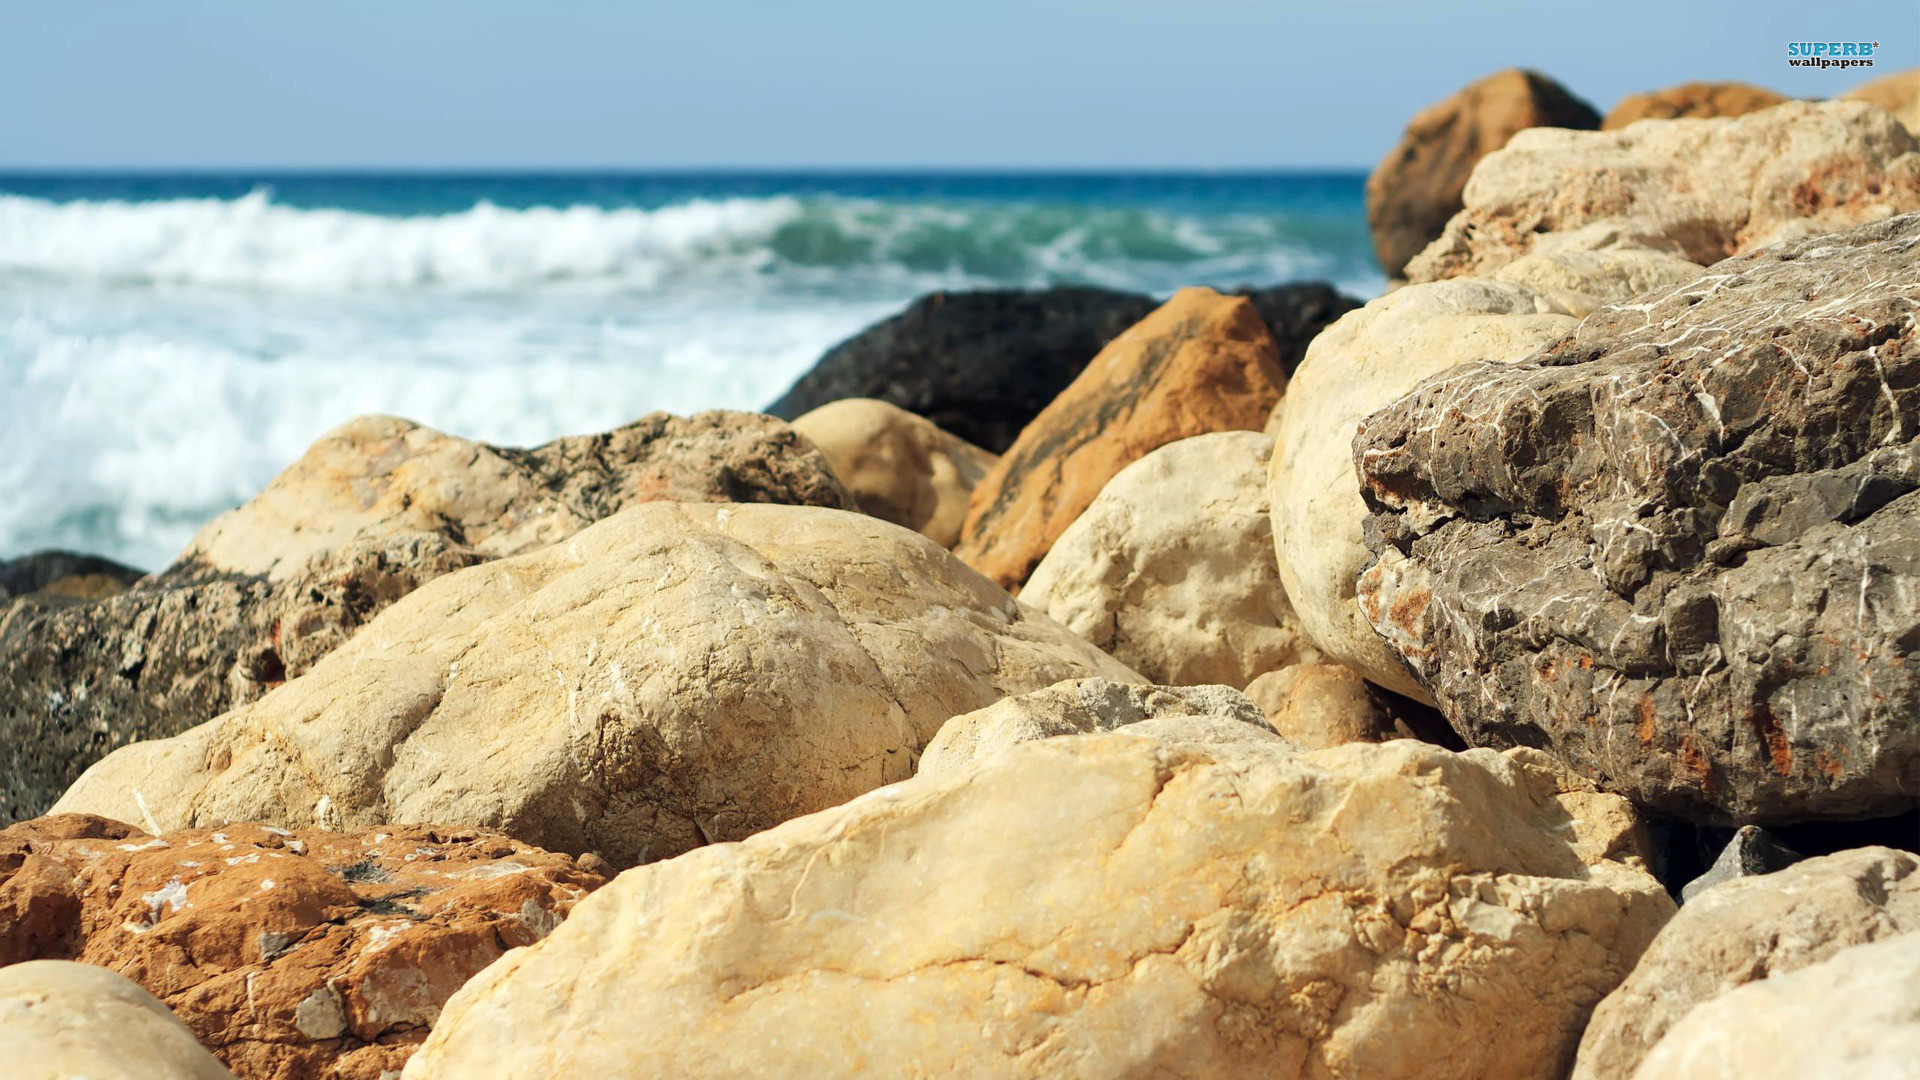 Beach Rocks Wallpaper HD